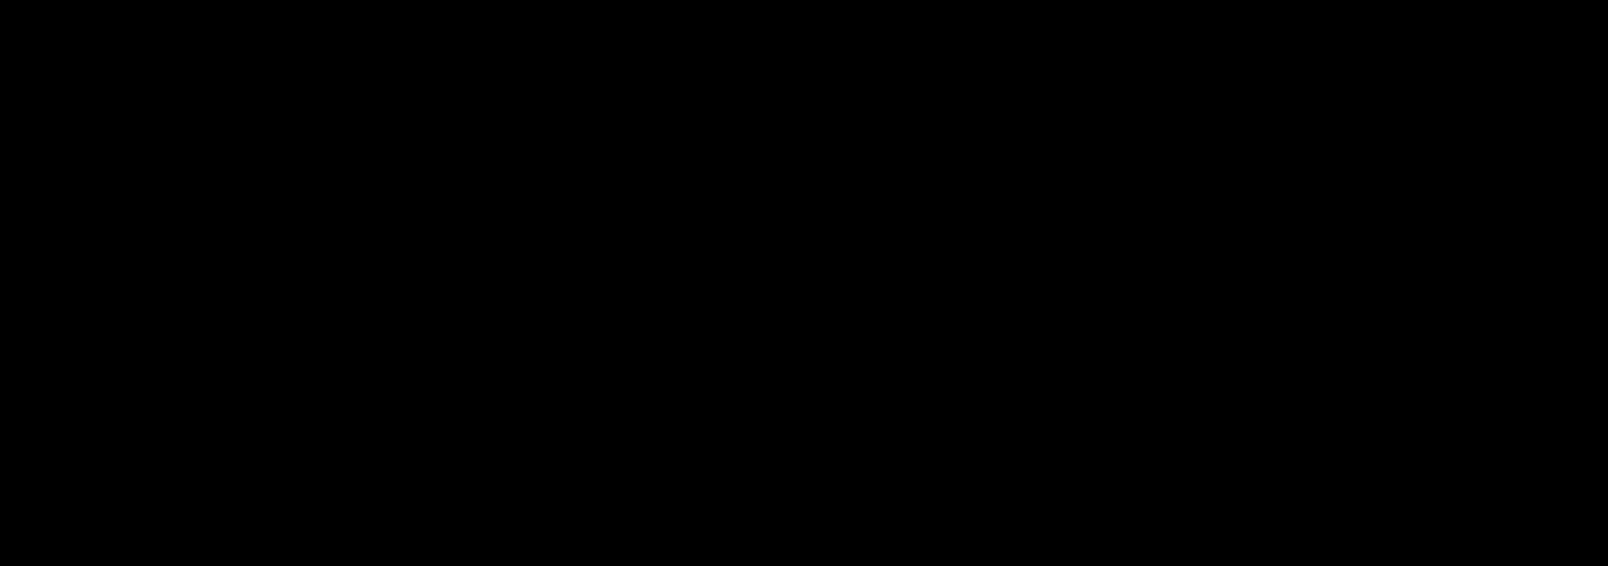 Aripiprazole hydroxybutyl impurity